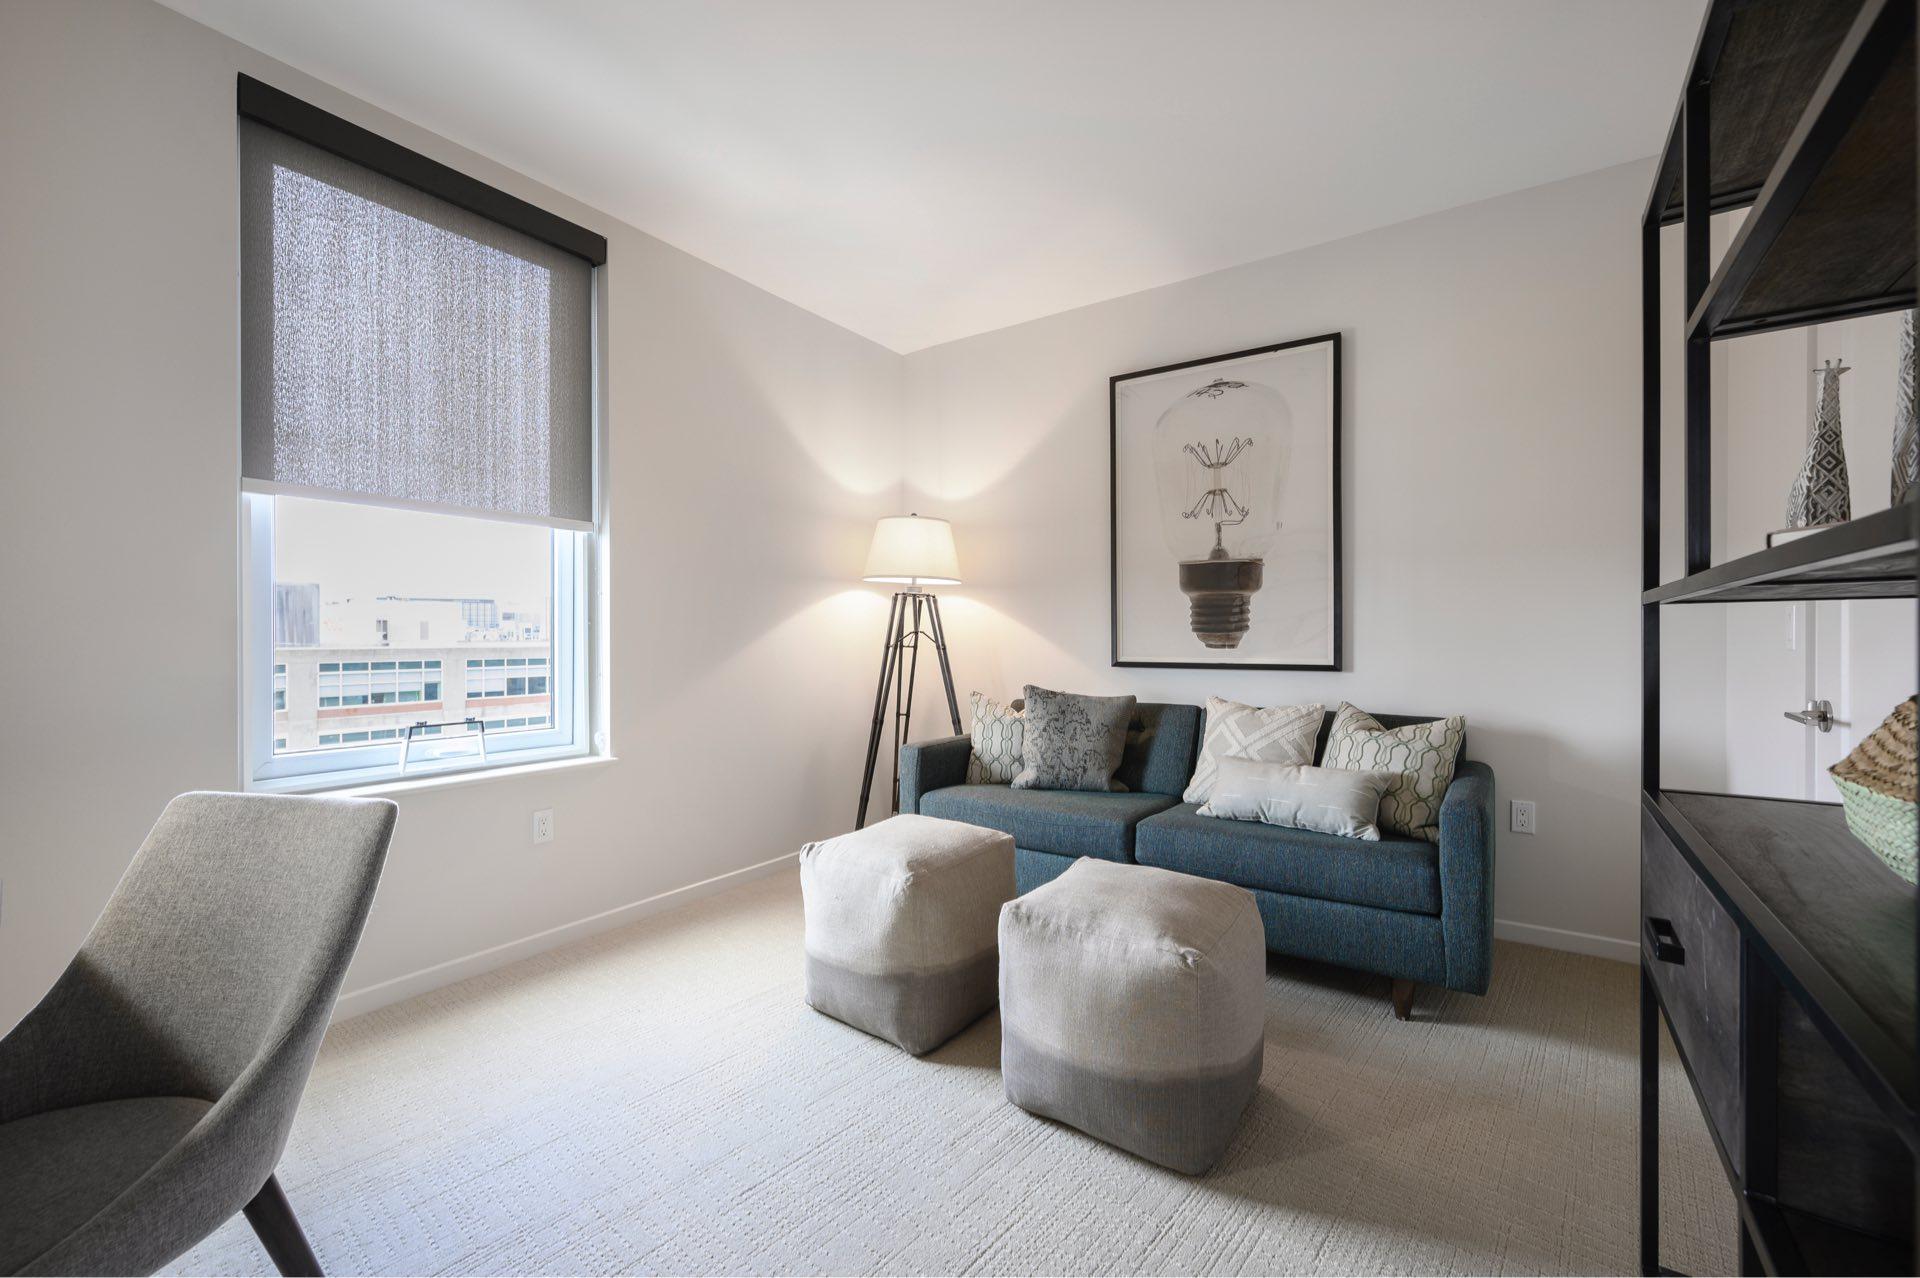 Apartments img 31